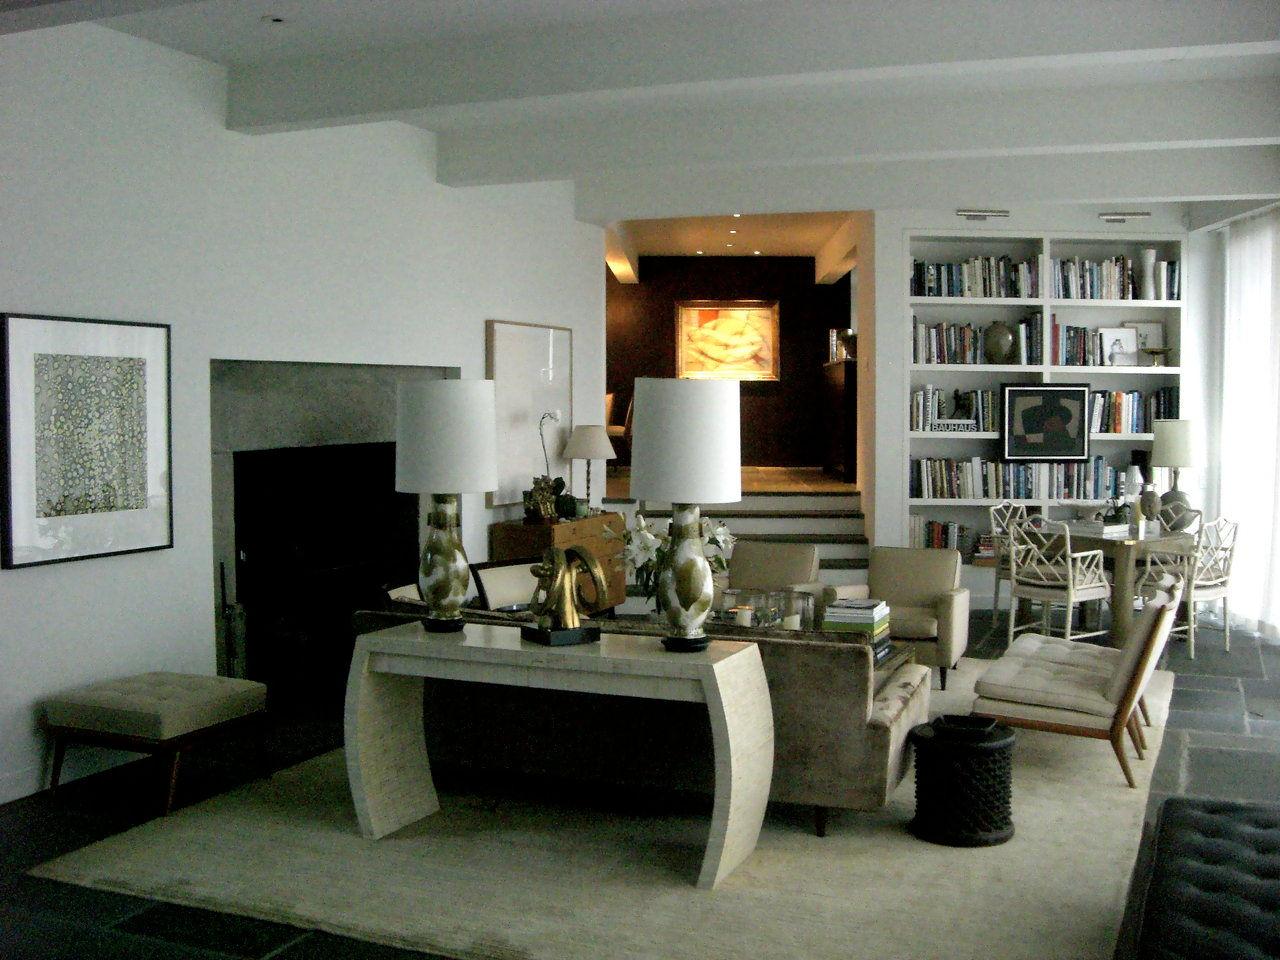 bridgewater house bca living room furniture